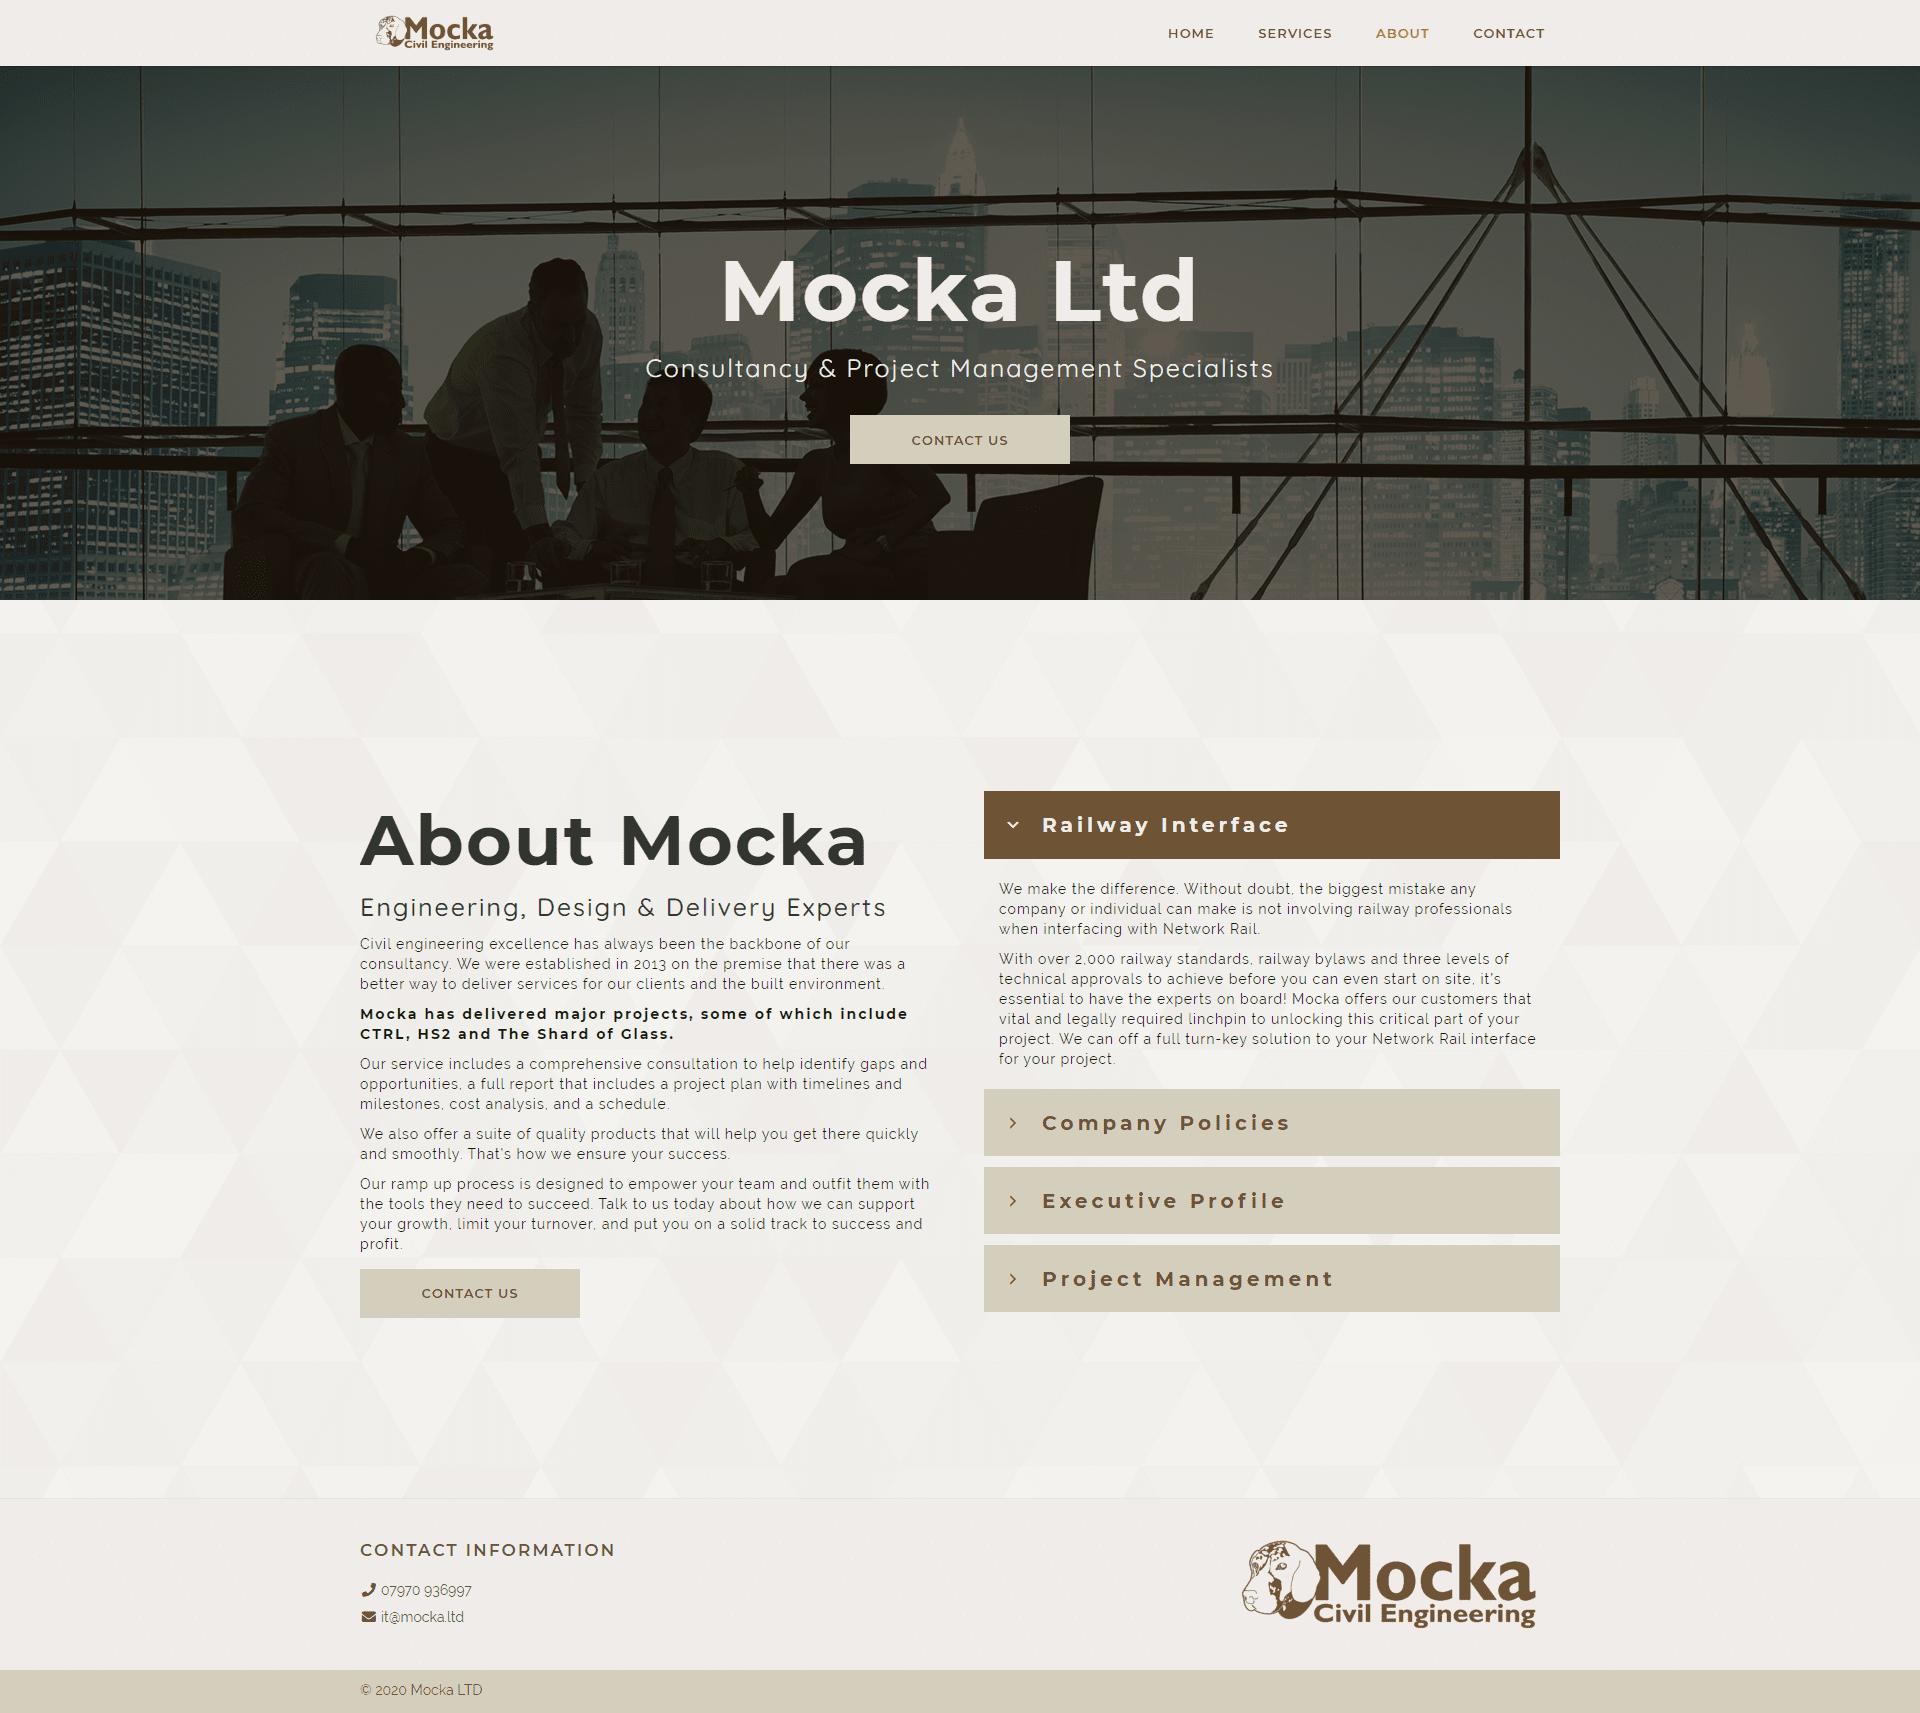 screencapture-mocka-ltd-about-